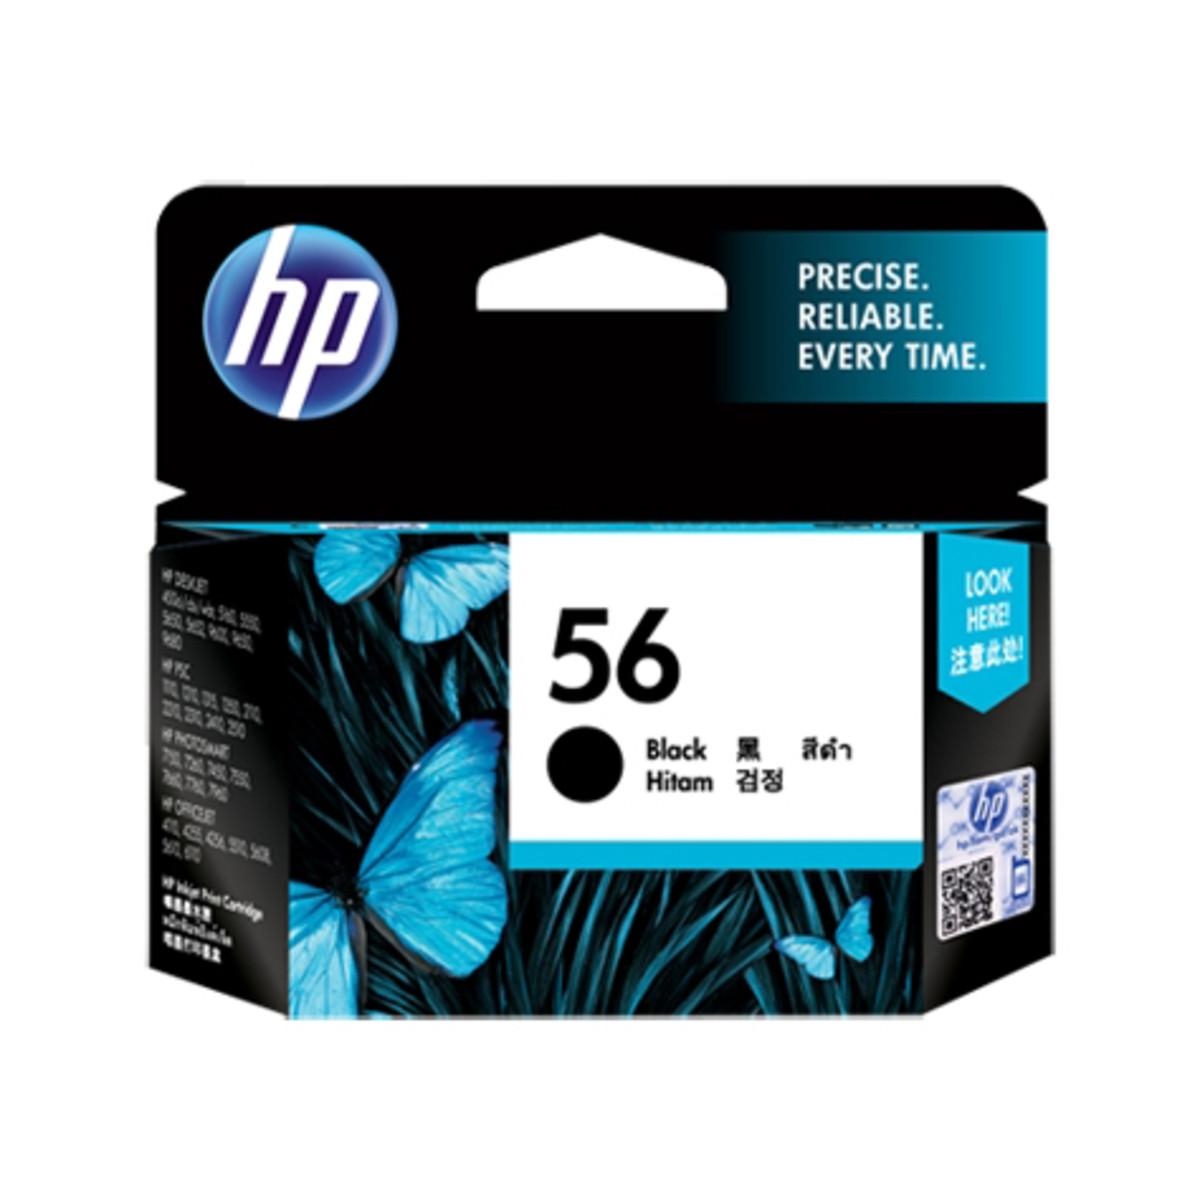 HP 56 (C6656AA) Black Ink Cartridge